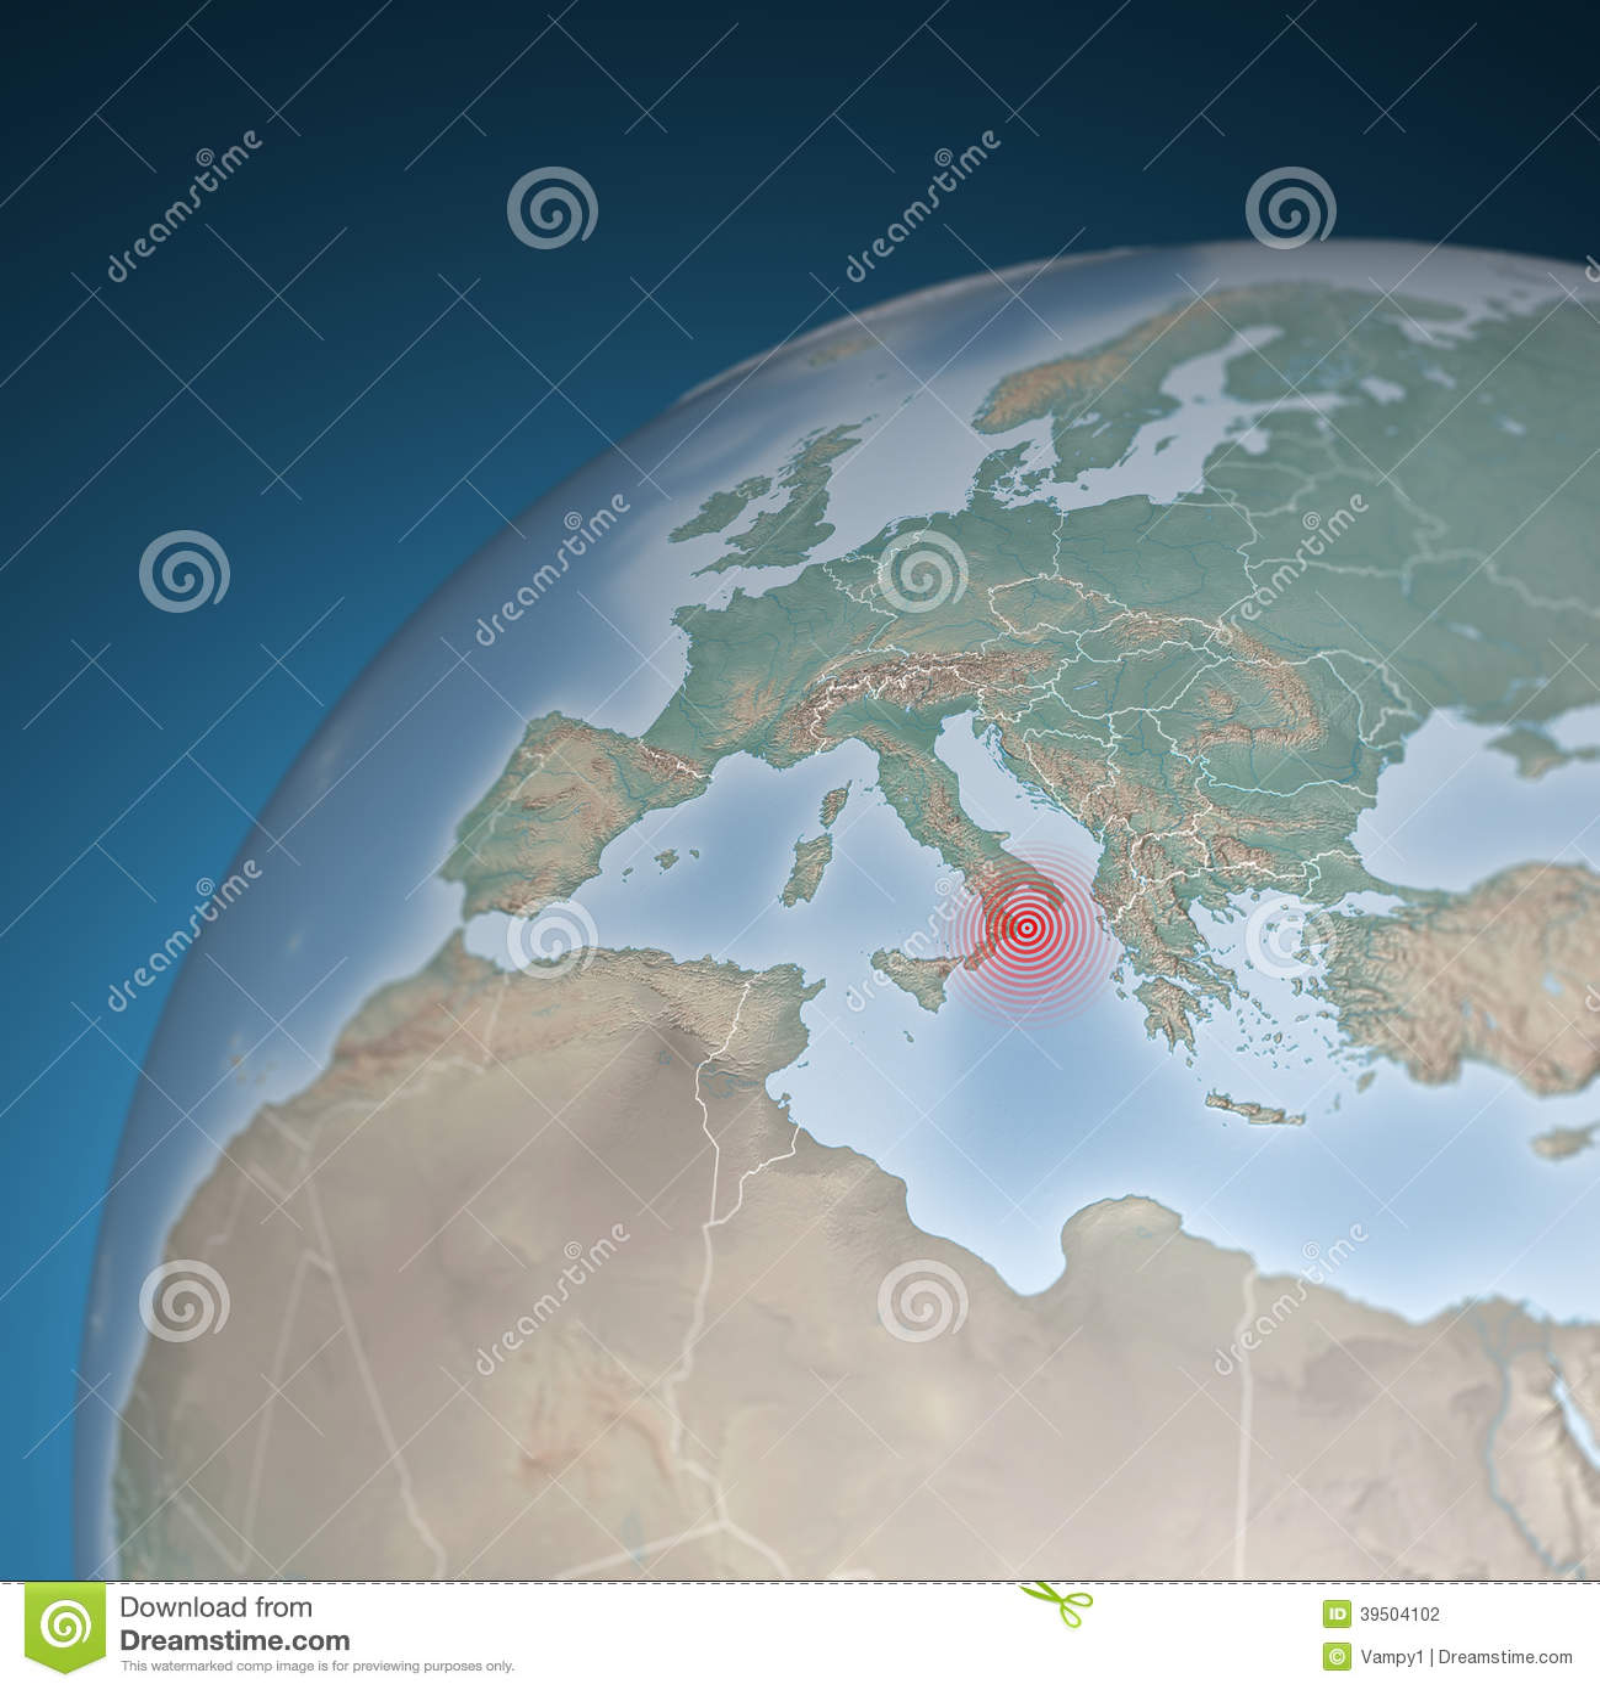 Europe map, Italy, earthquake shock